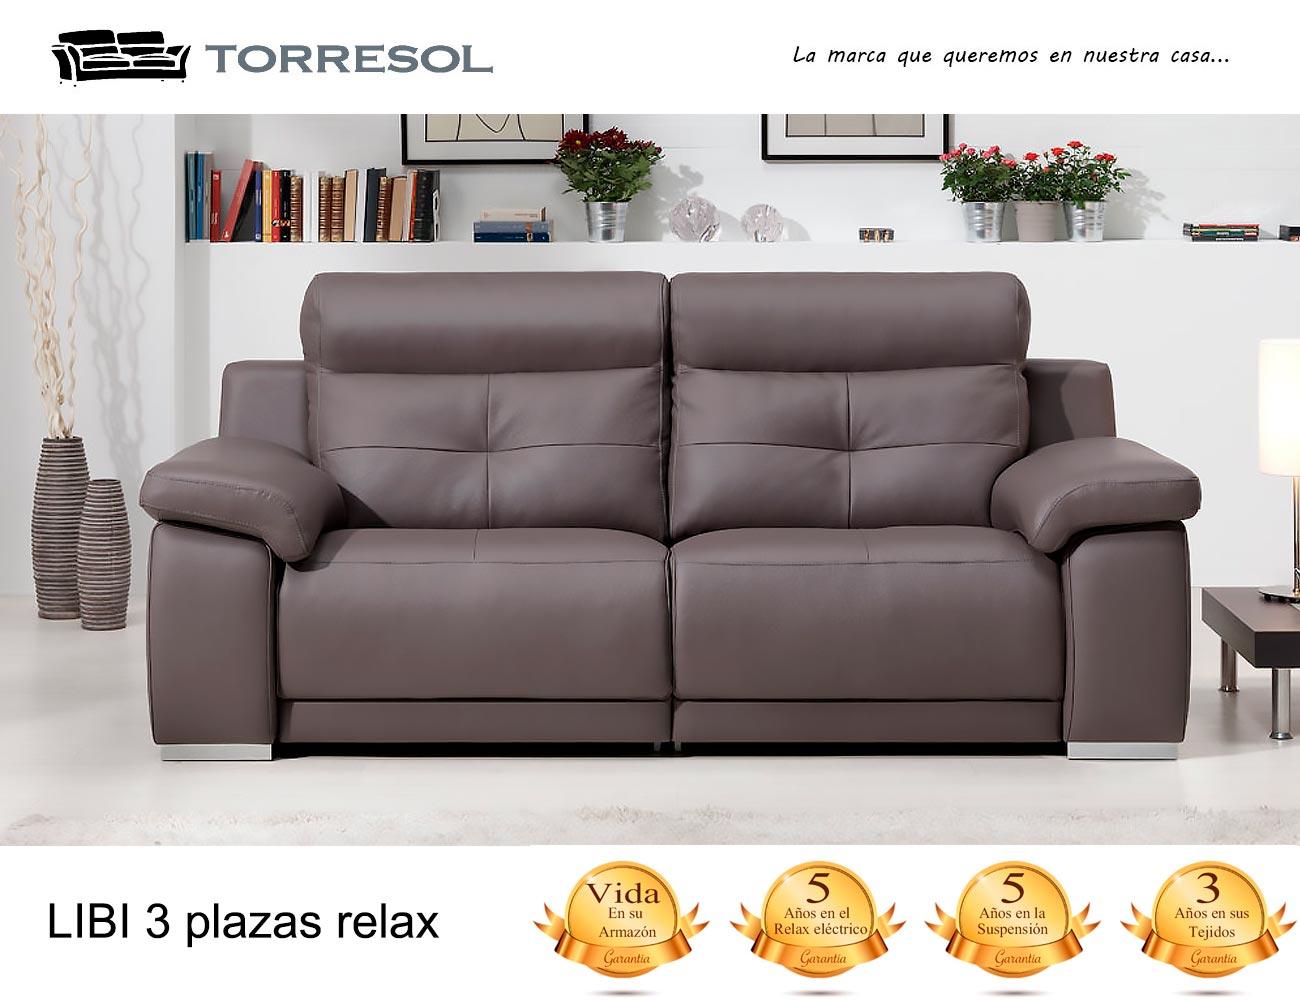 Sofa libi torresol en piel chocolate